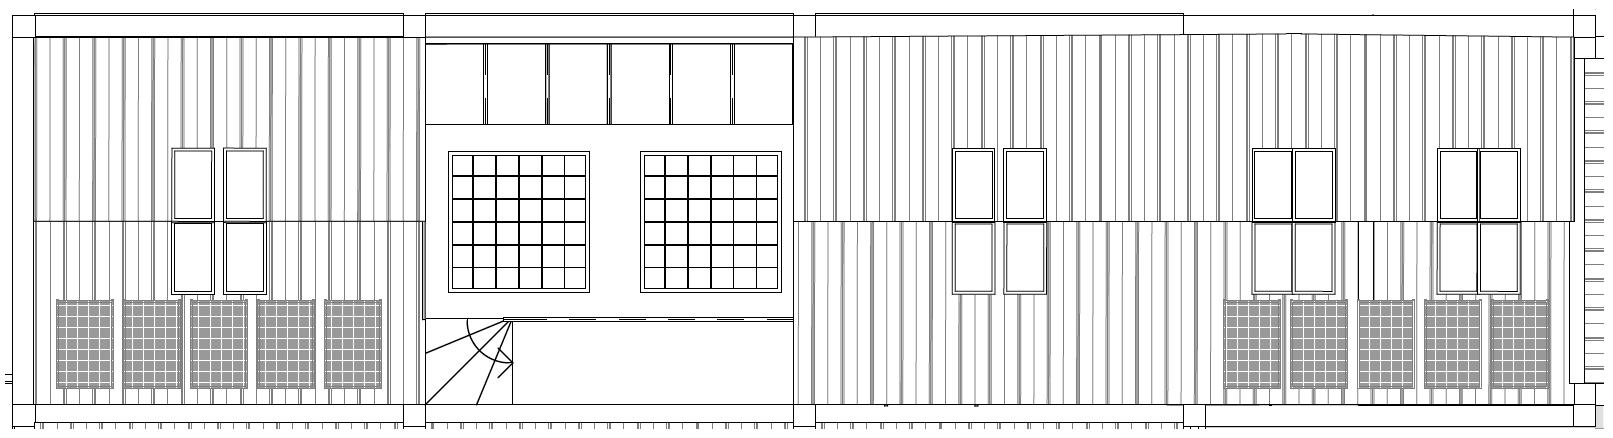 Flat 2 roof plan